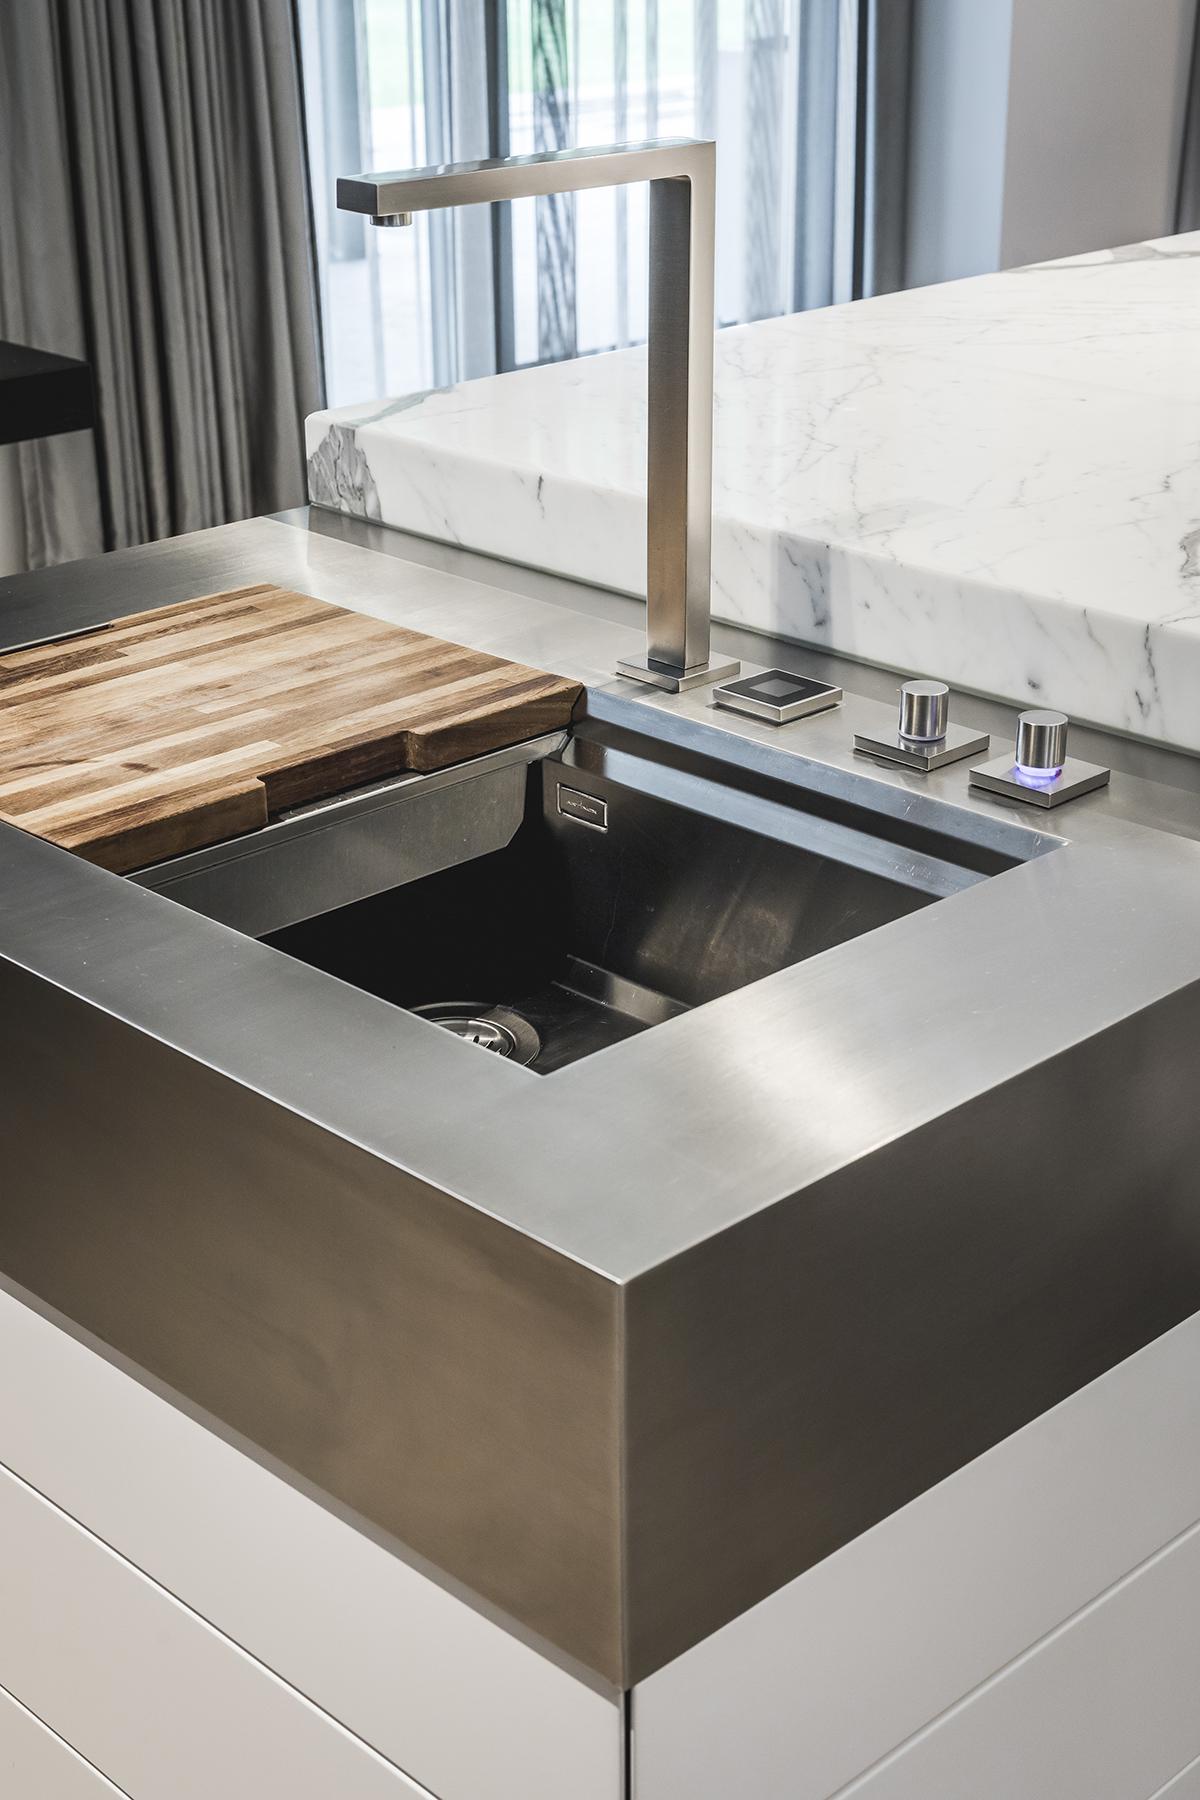 Exclusieve keuken, Culimaat, high-end kitchens, hoogwaardig materiaal, marmer, riant kookeiland